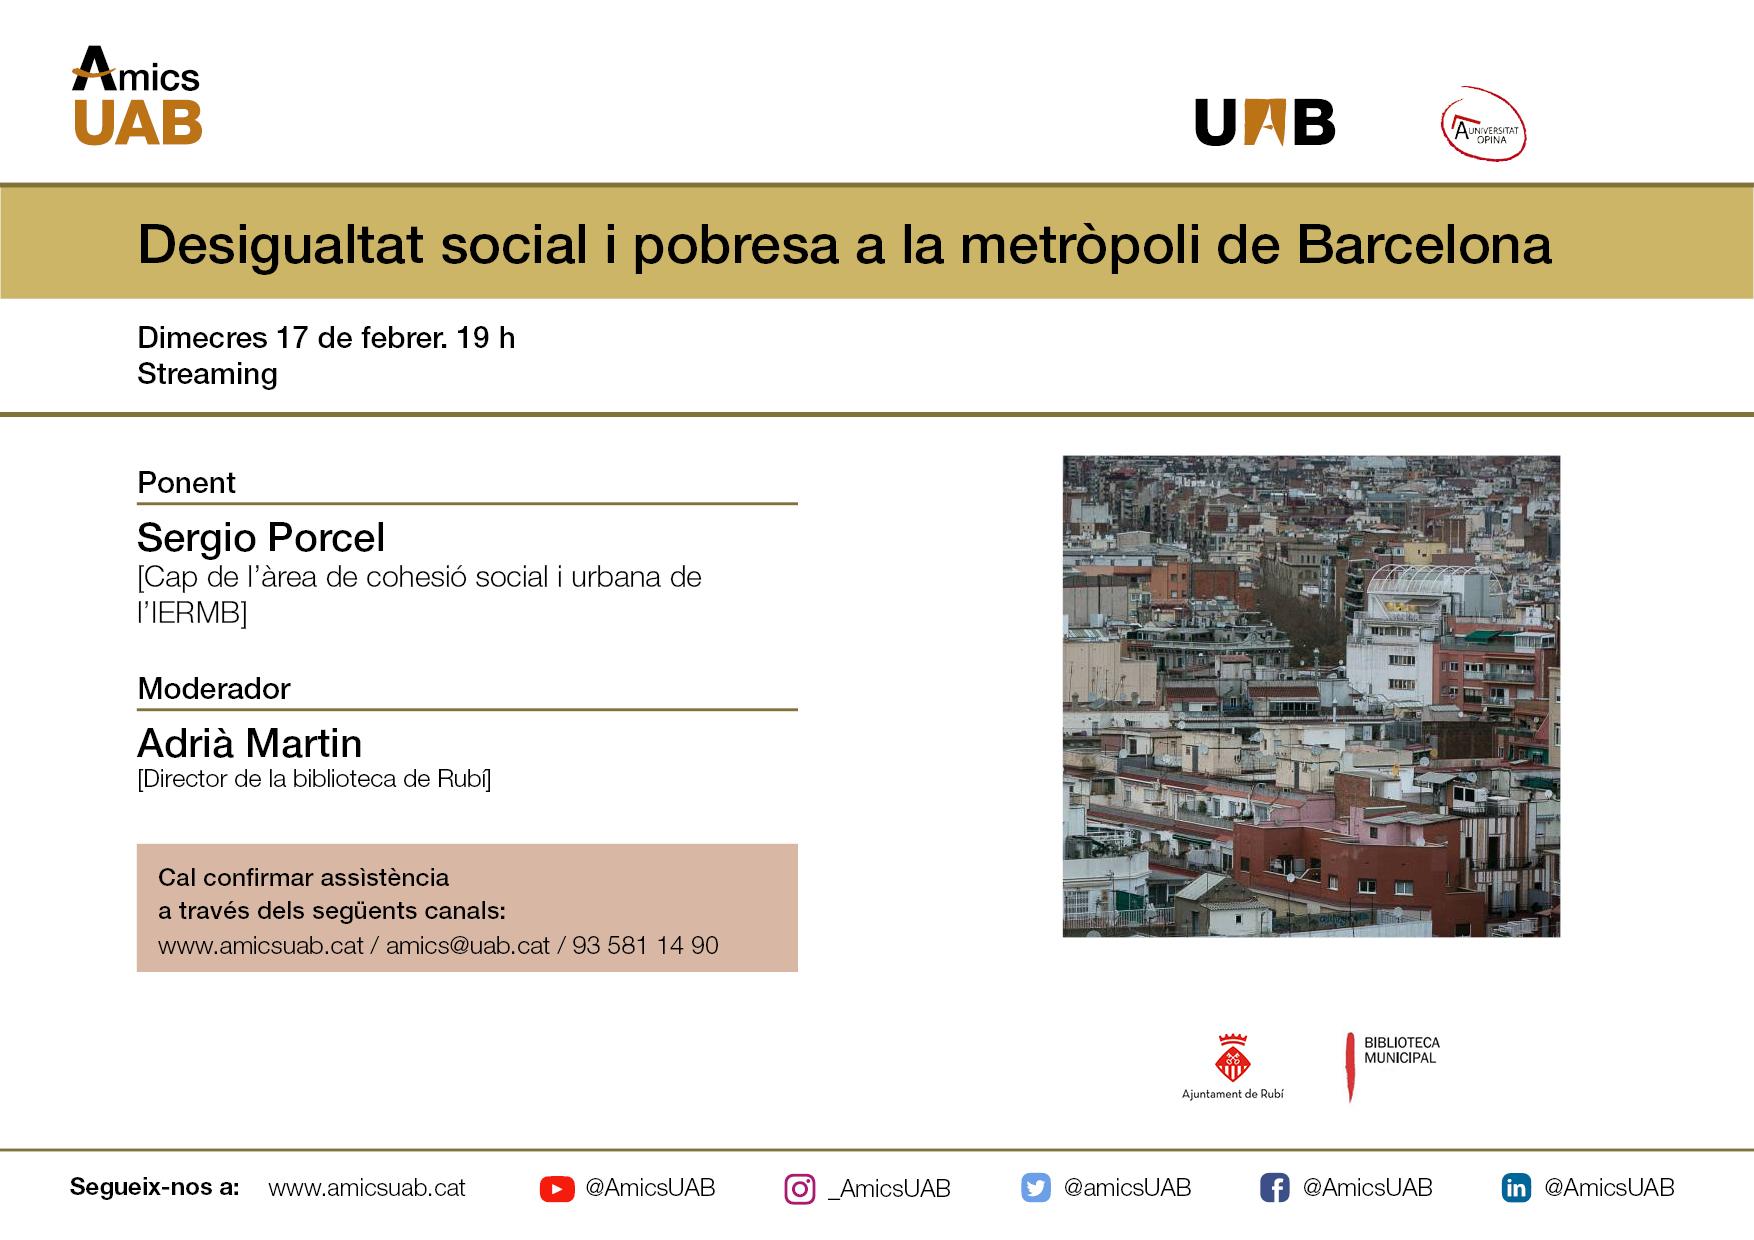 Desigualtat Barcelona